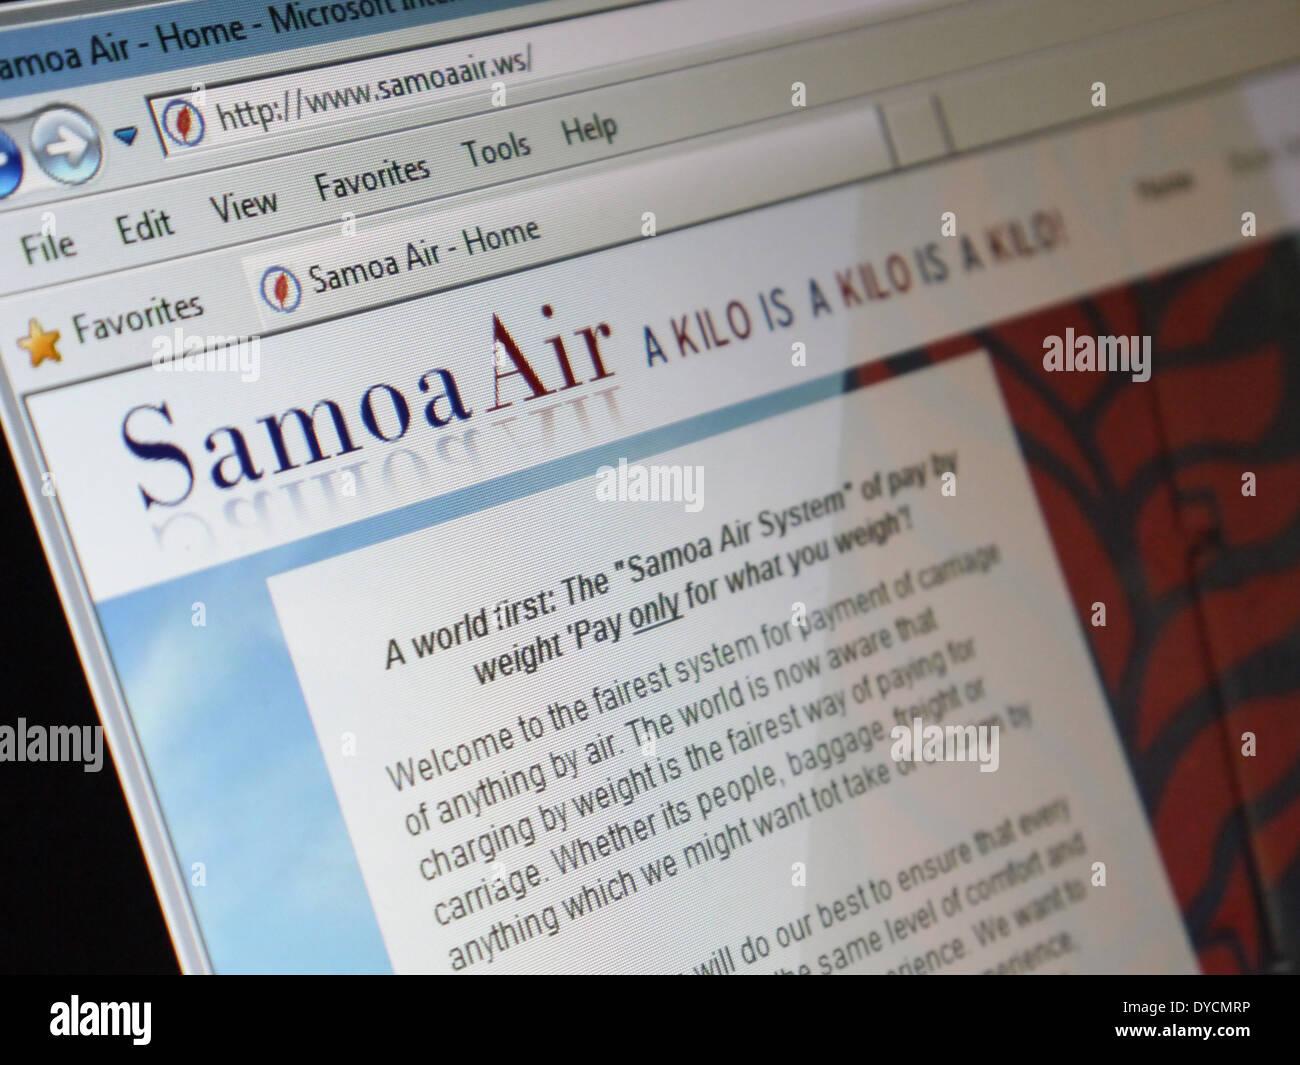 samoa air website - Stock Image